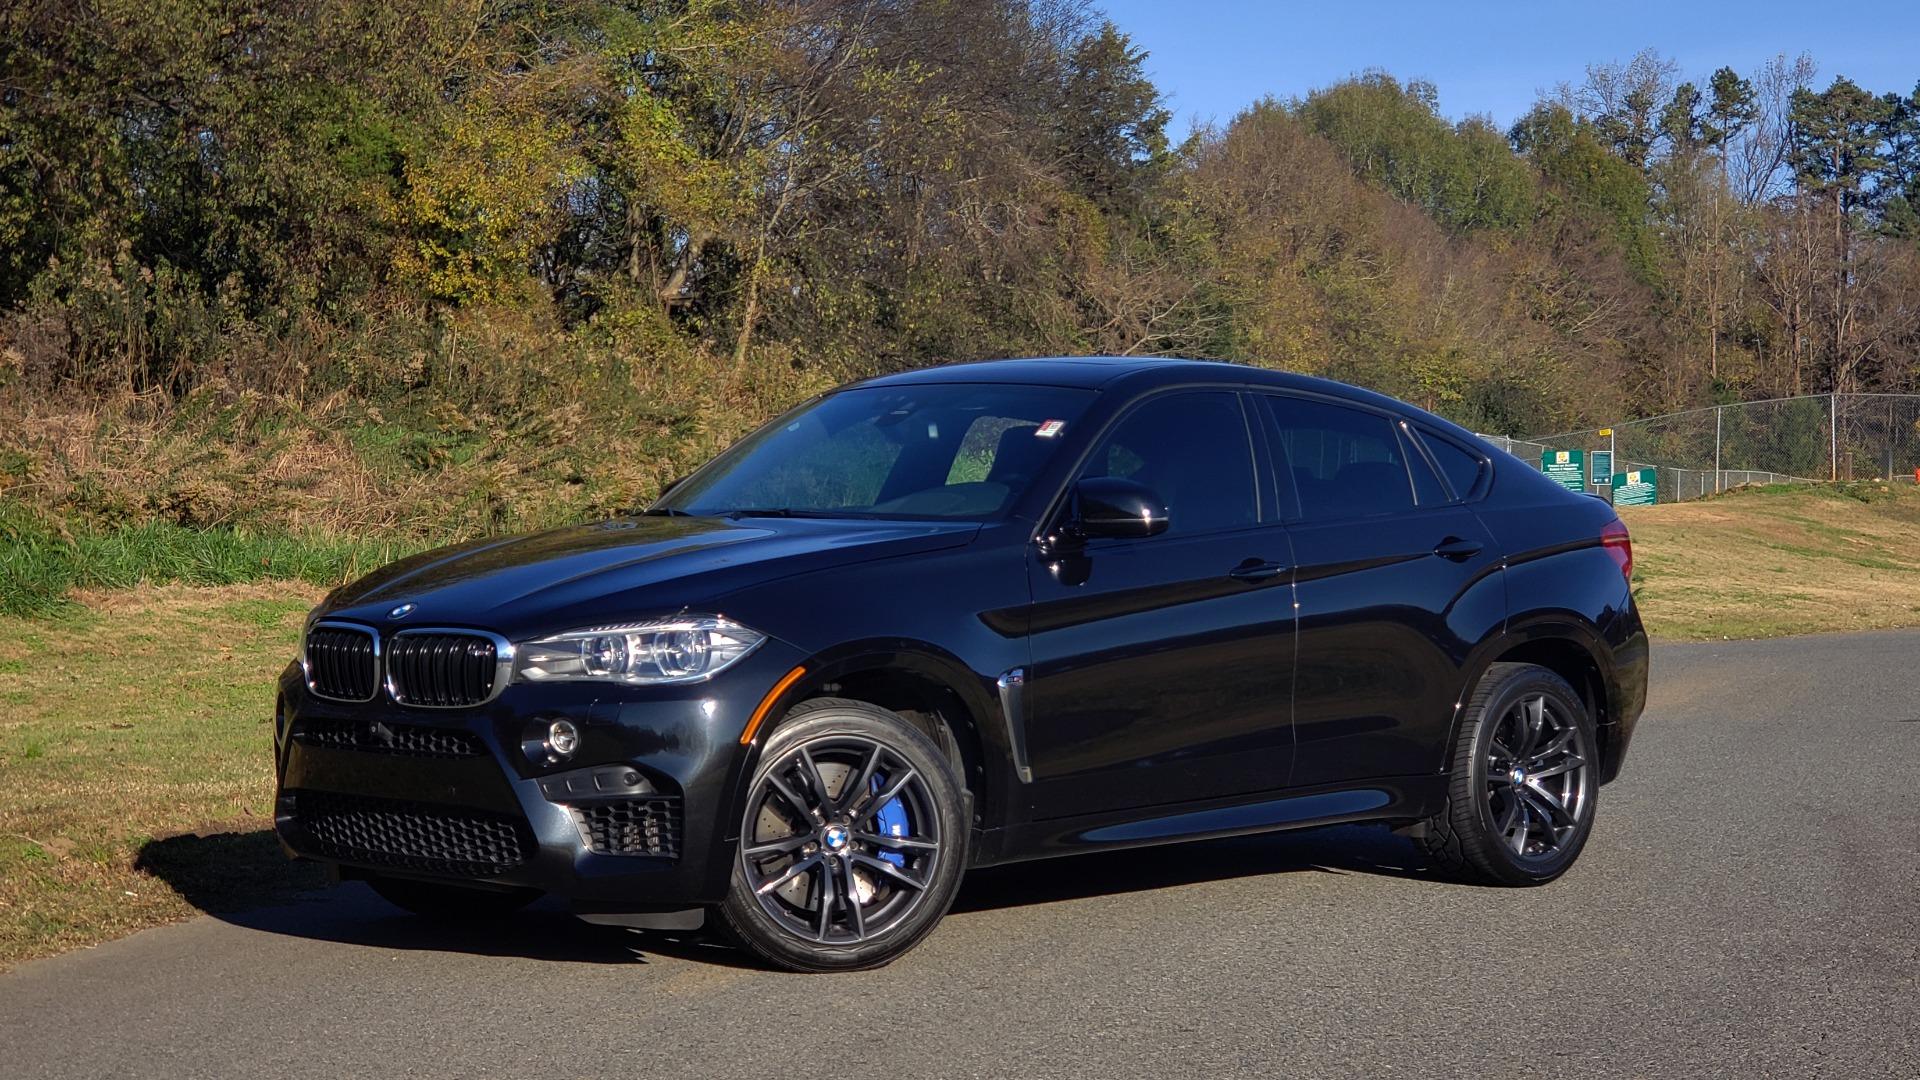 Used 2016 BMW X6 M EXEC PKG / DRVR ASST / NAV / SUNROOF / BLIND SPOT / REARVIEW for sale Sold at Formula Imports in Charlotte NC 28227 2